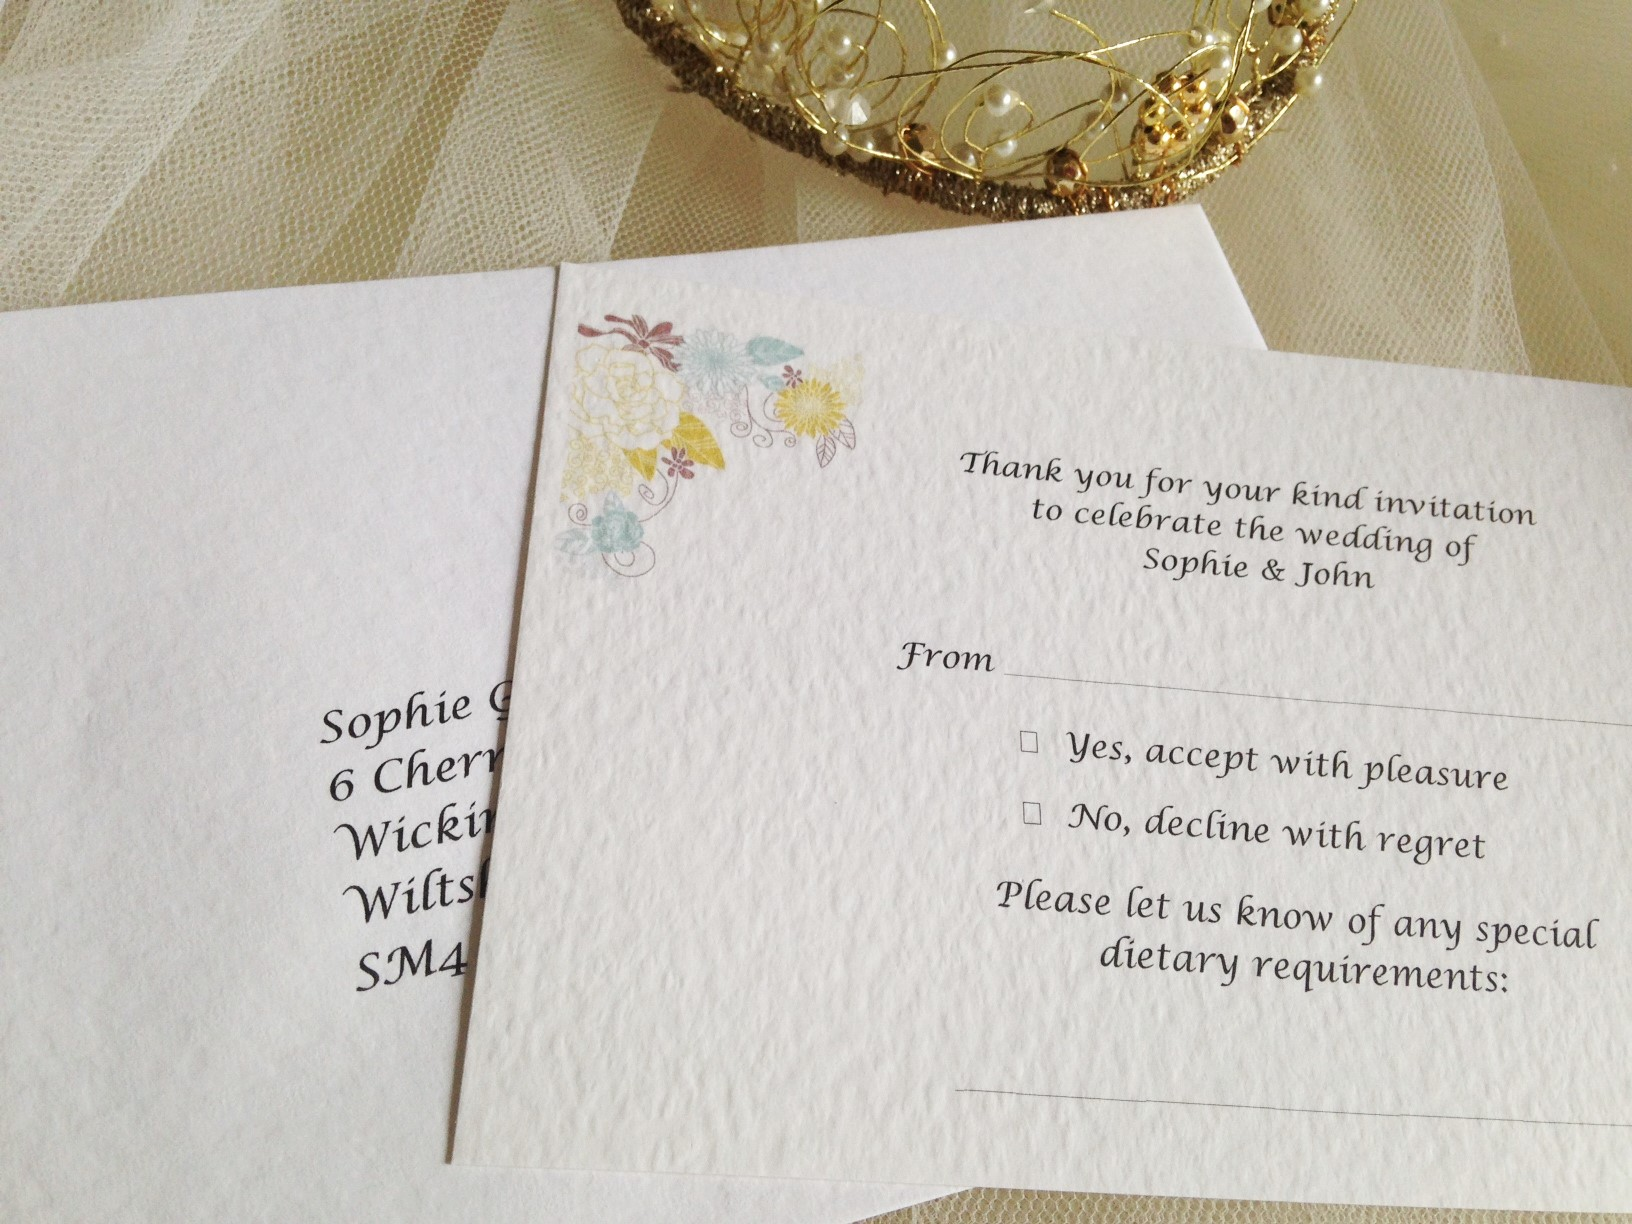 Blooms RSVP cards and envelopes